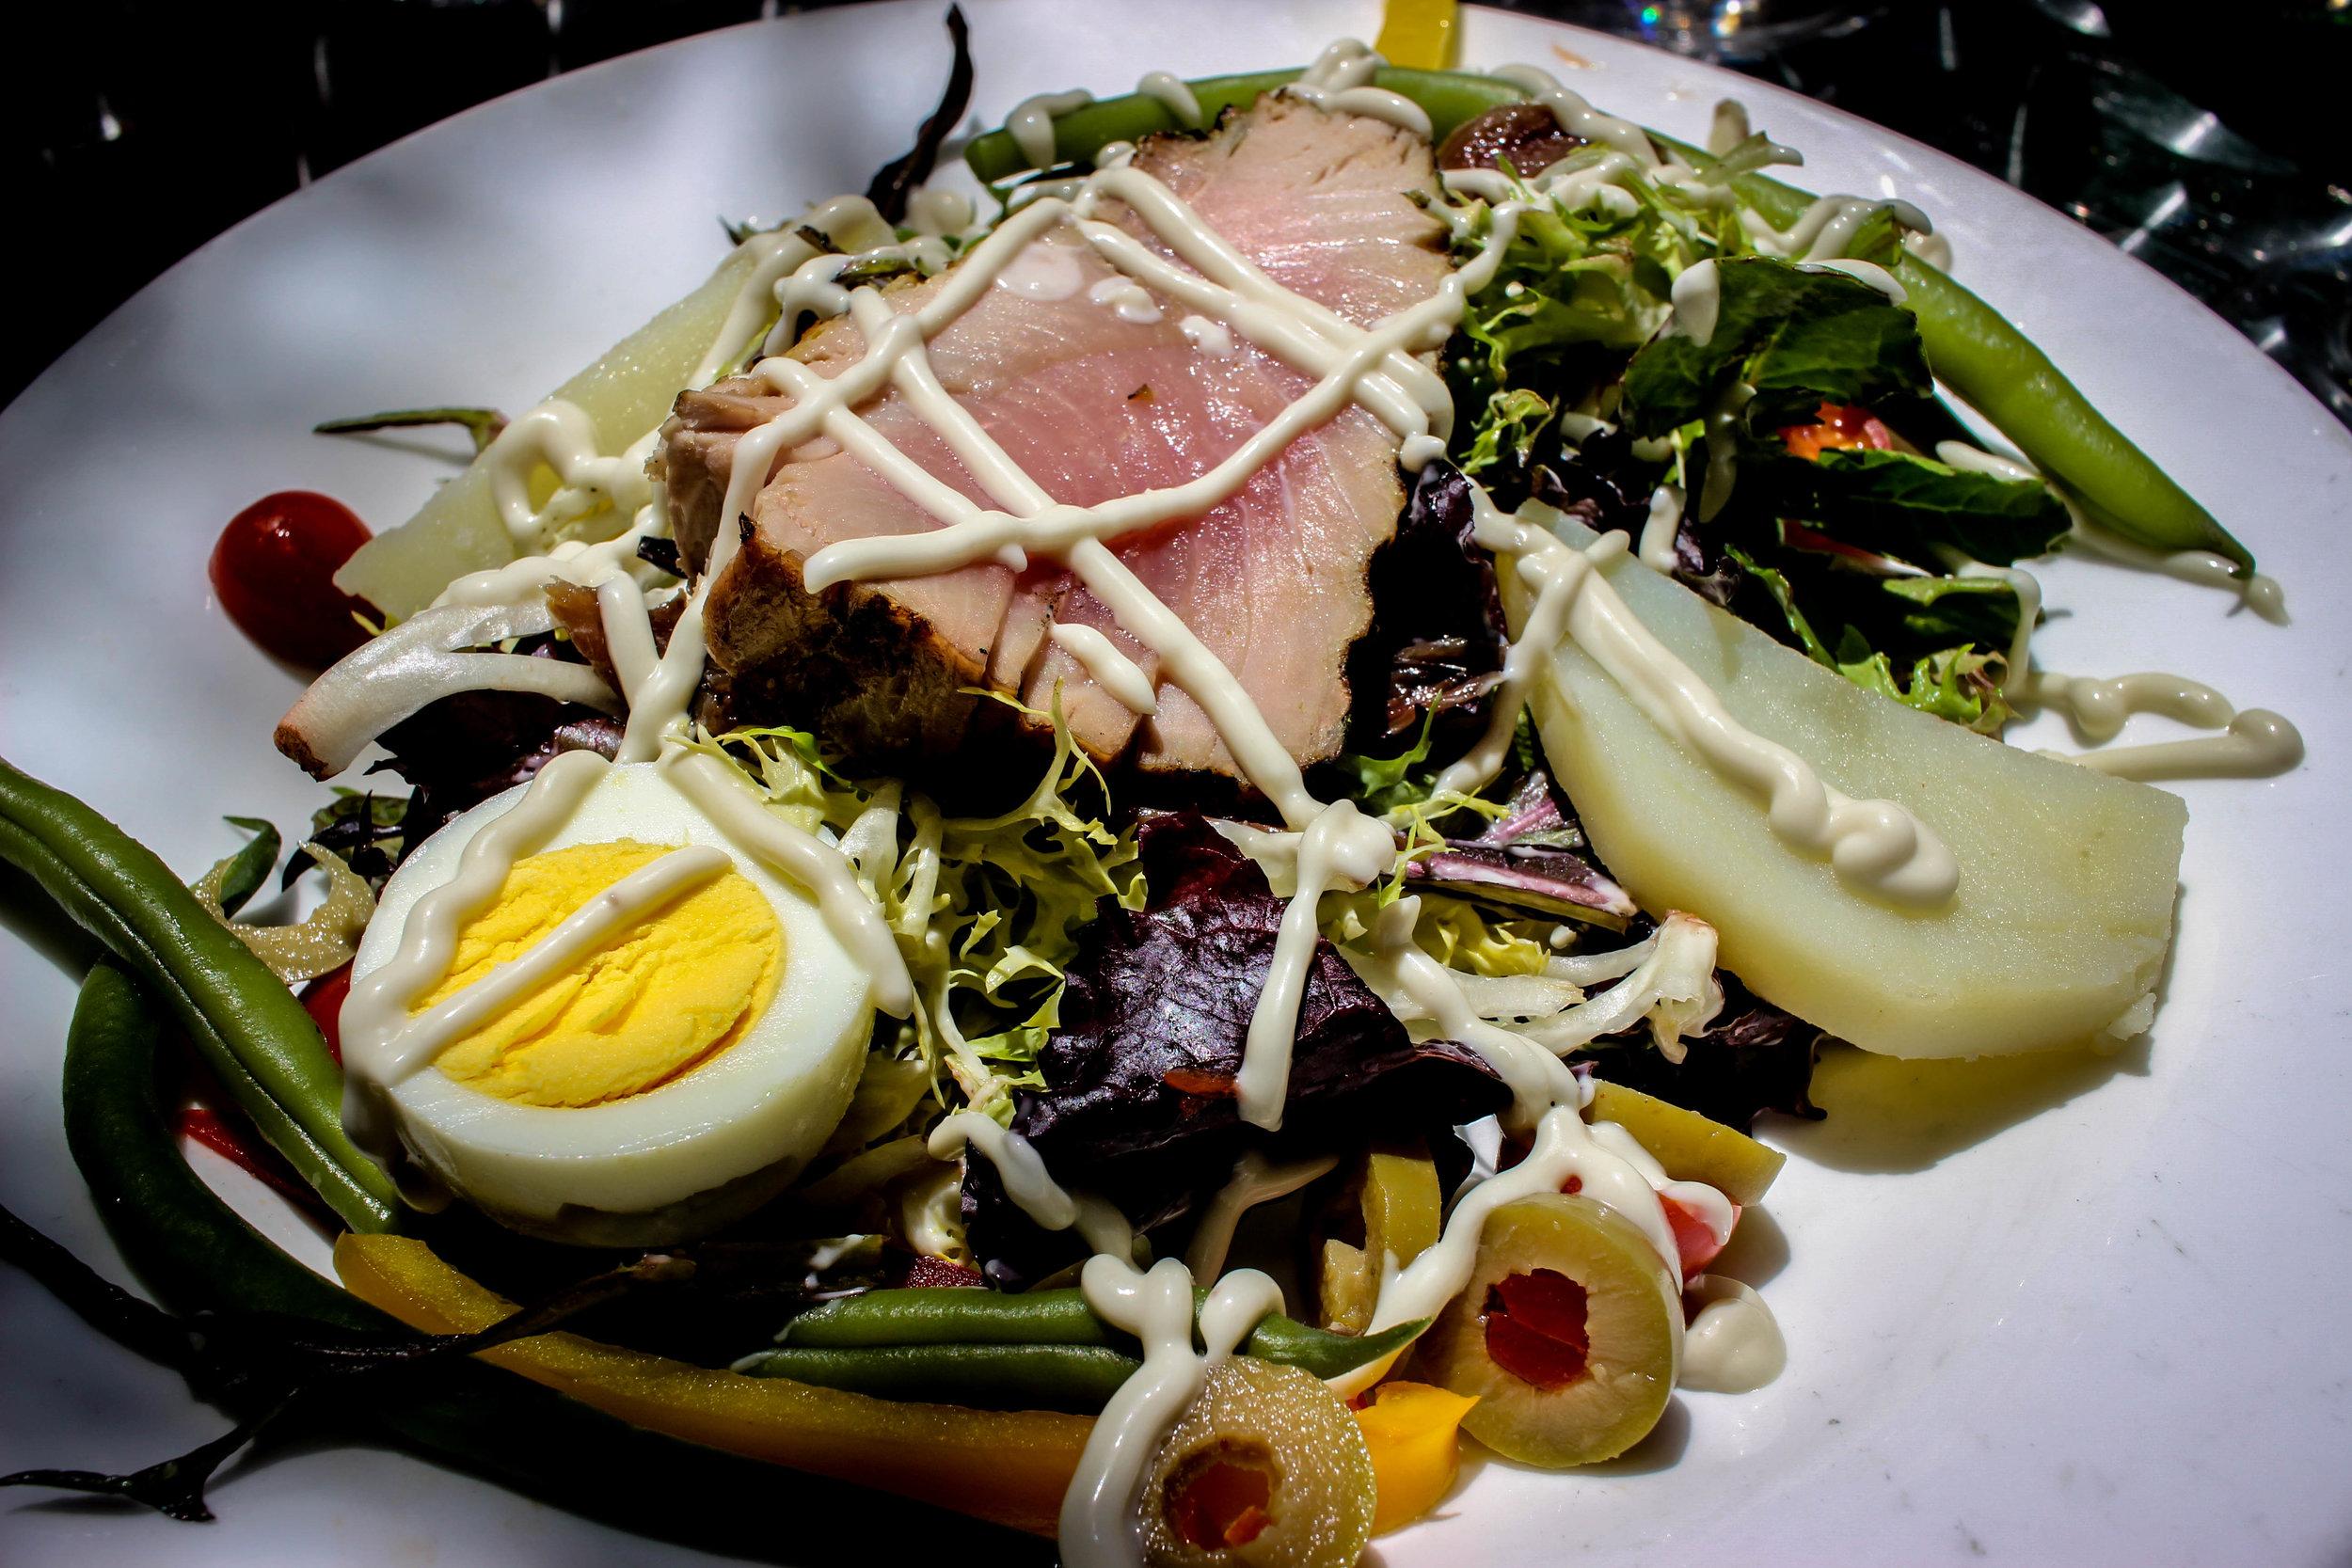 Salade Nicoise, vinaigrette aux anchois: traditional Nicoise Salad, Anchovy dressing